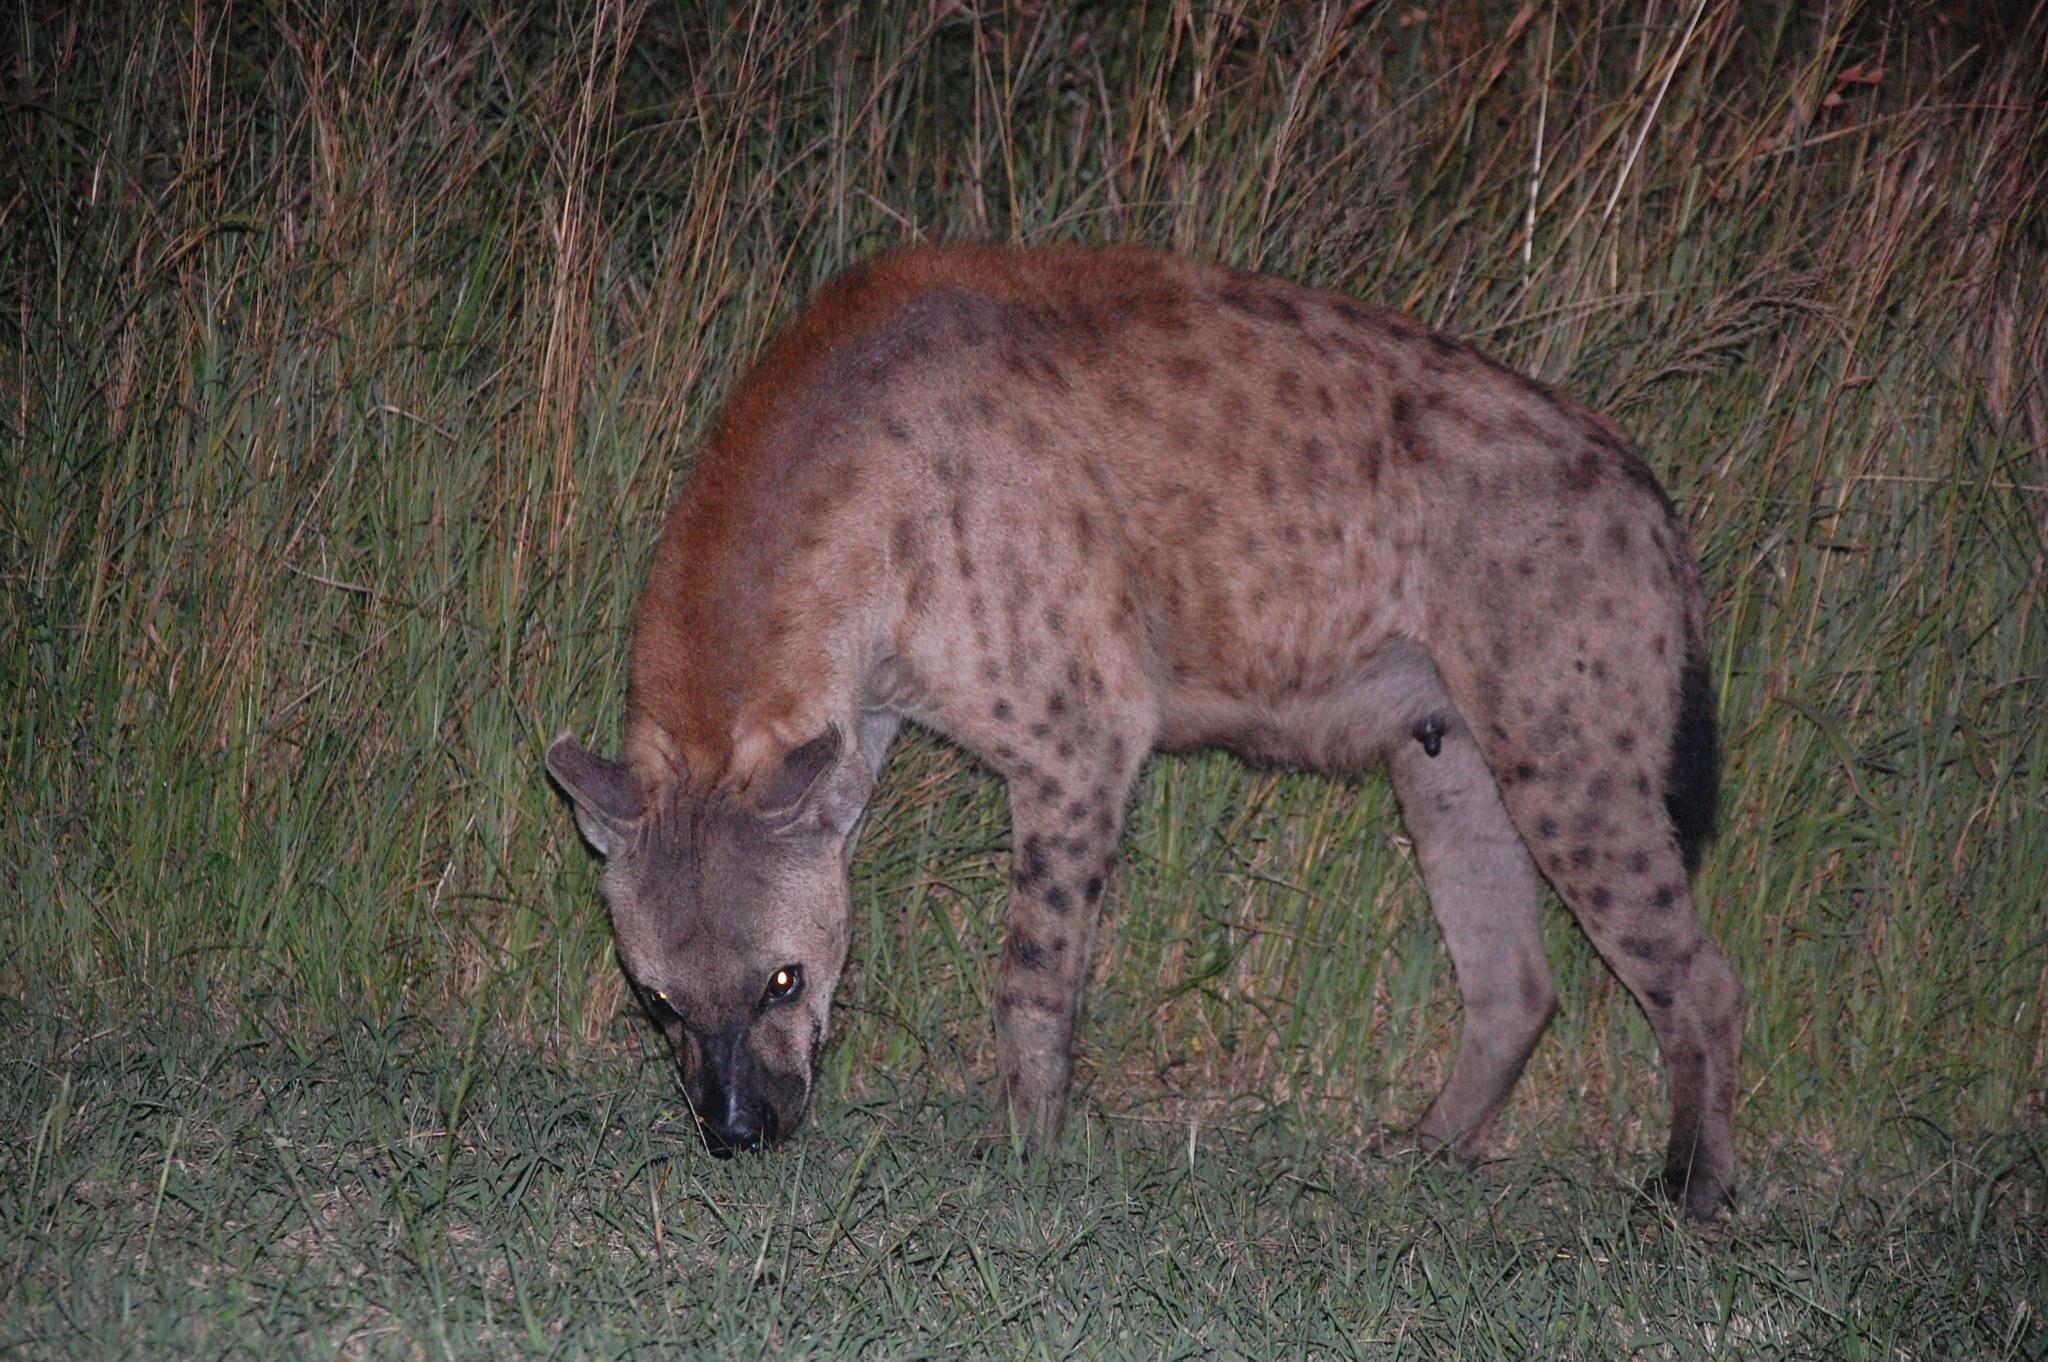 A Walk With Hyena by goga.dt